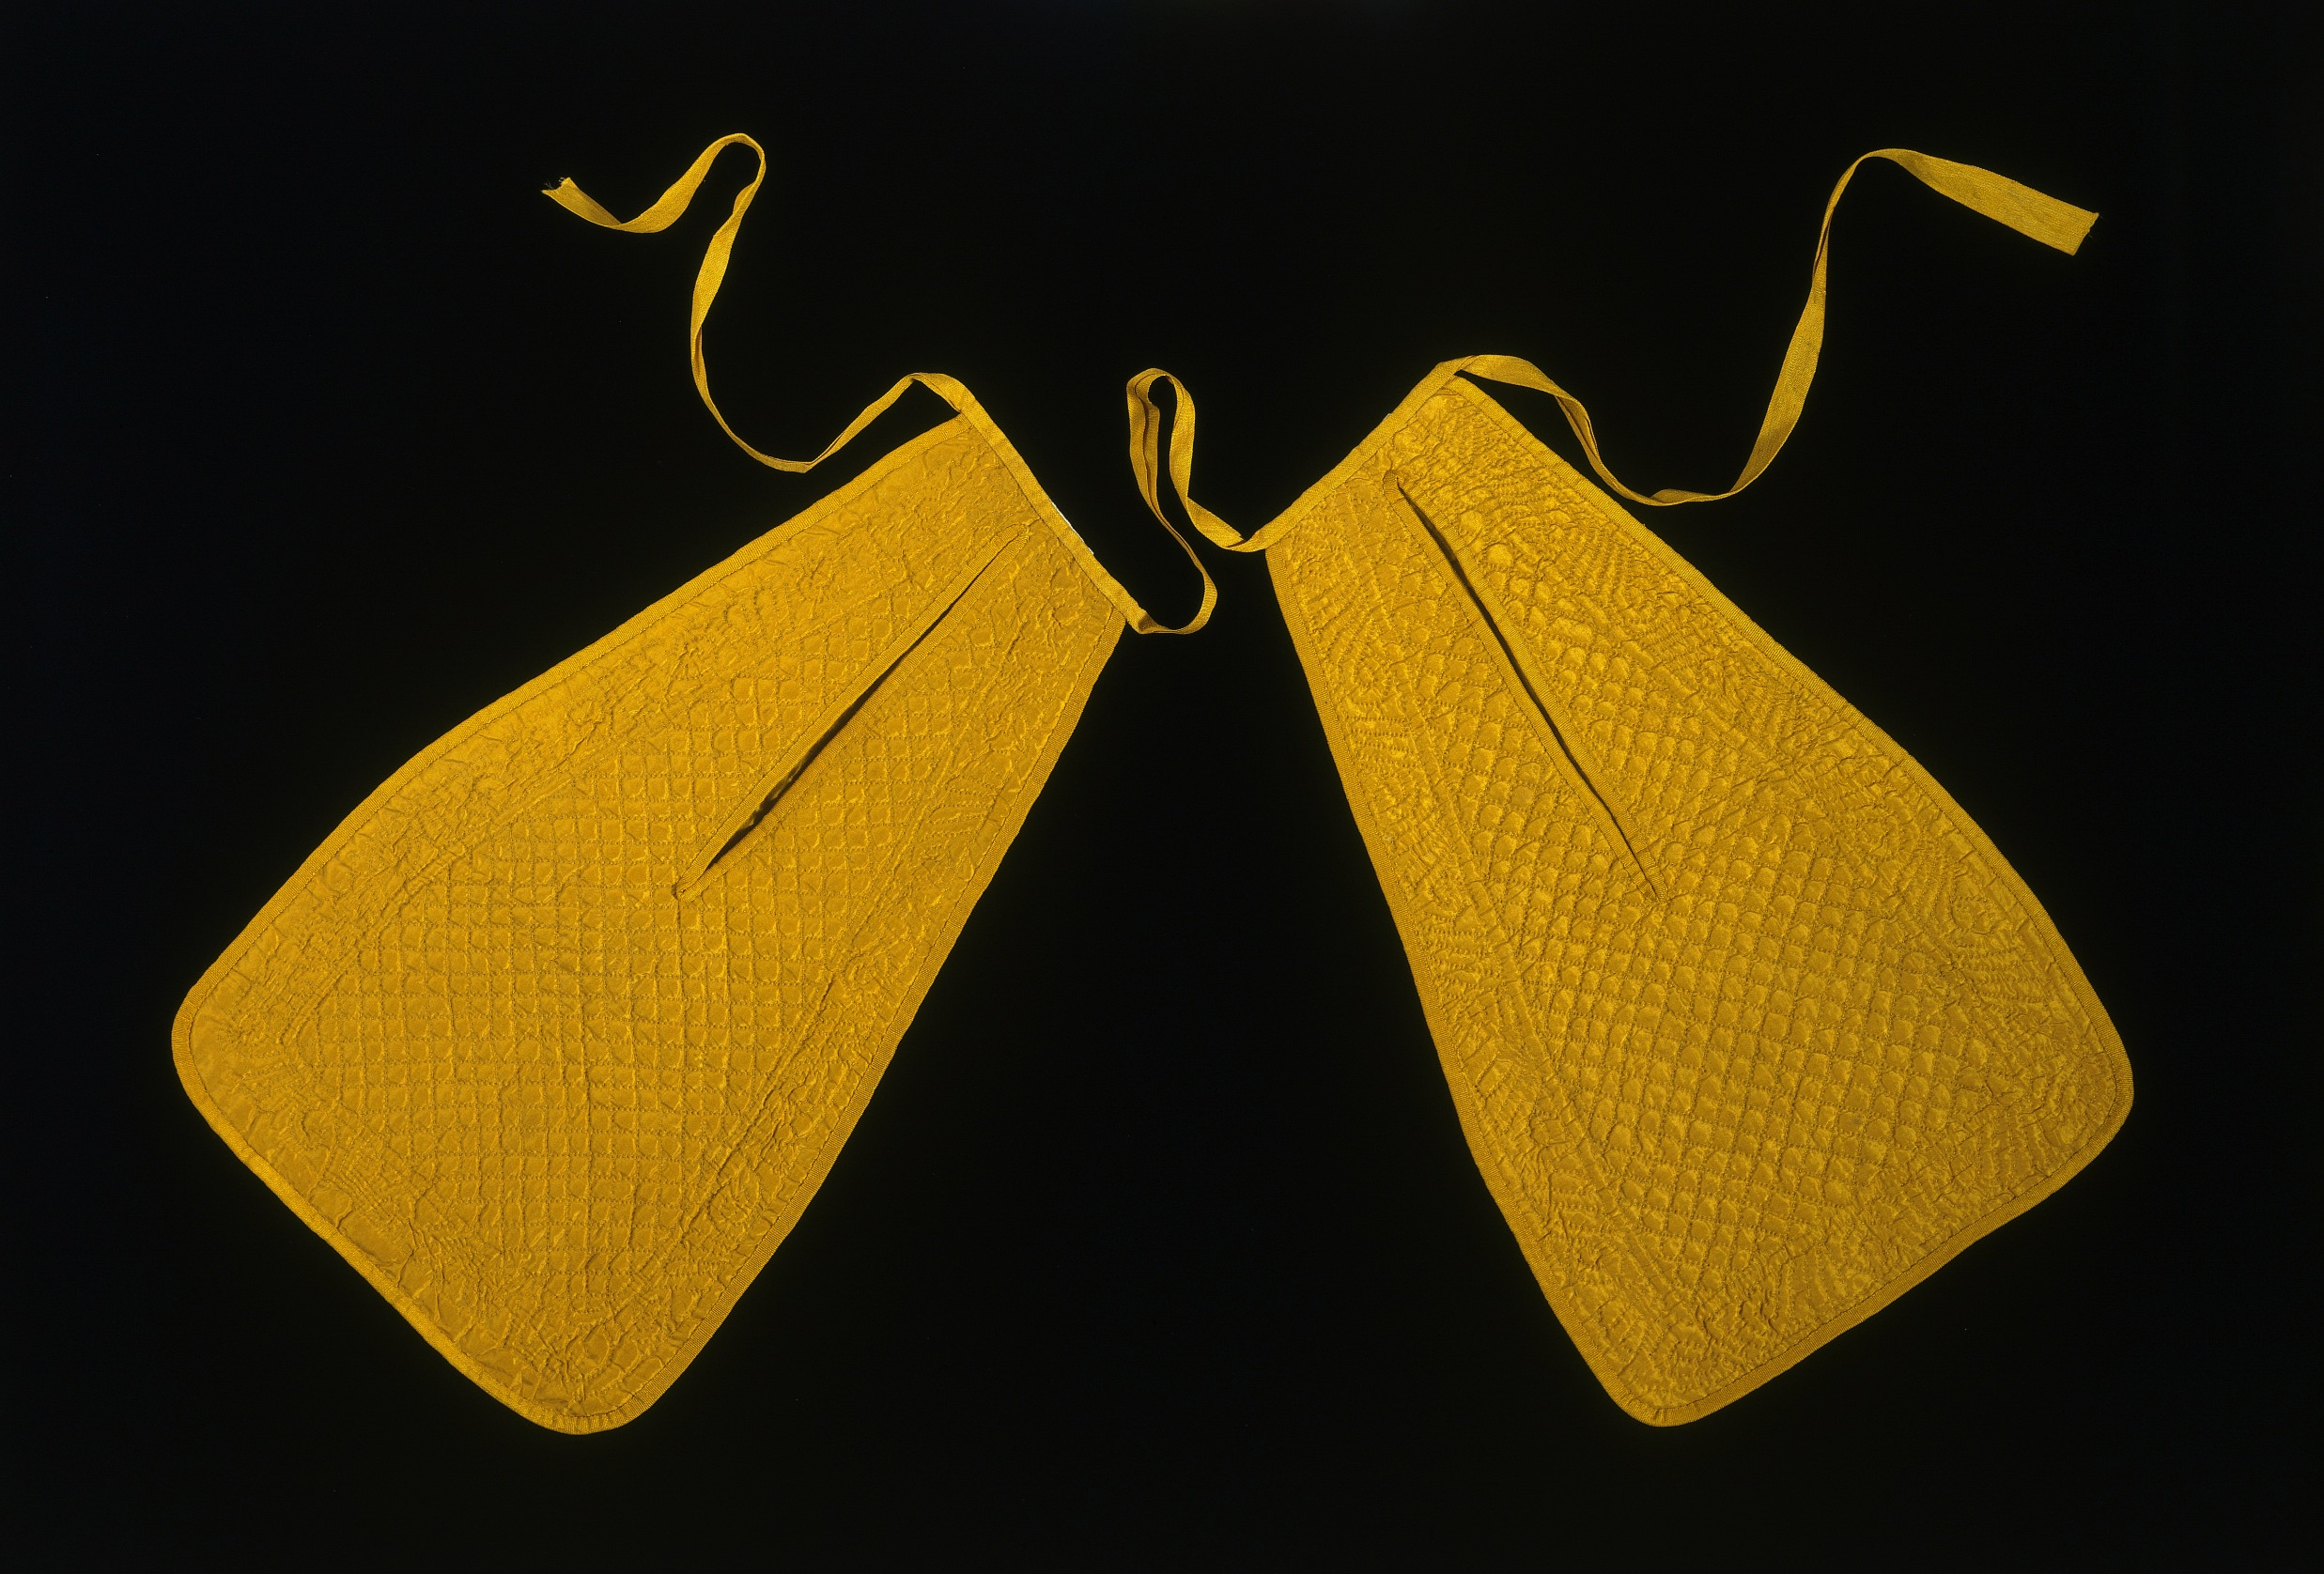 Smiths Empire montre de poche datant